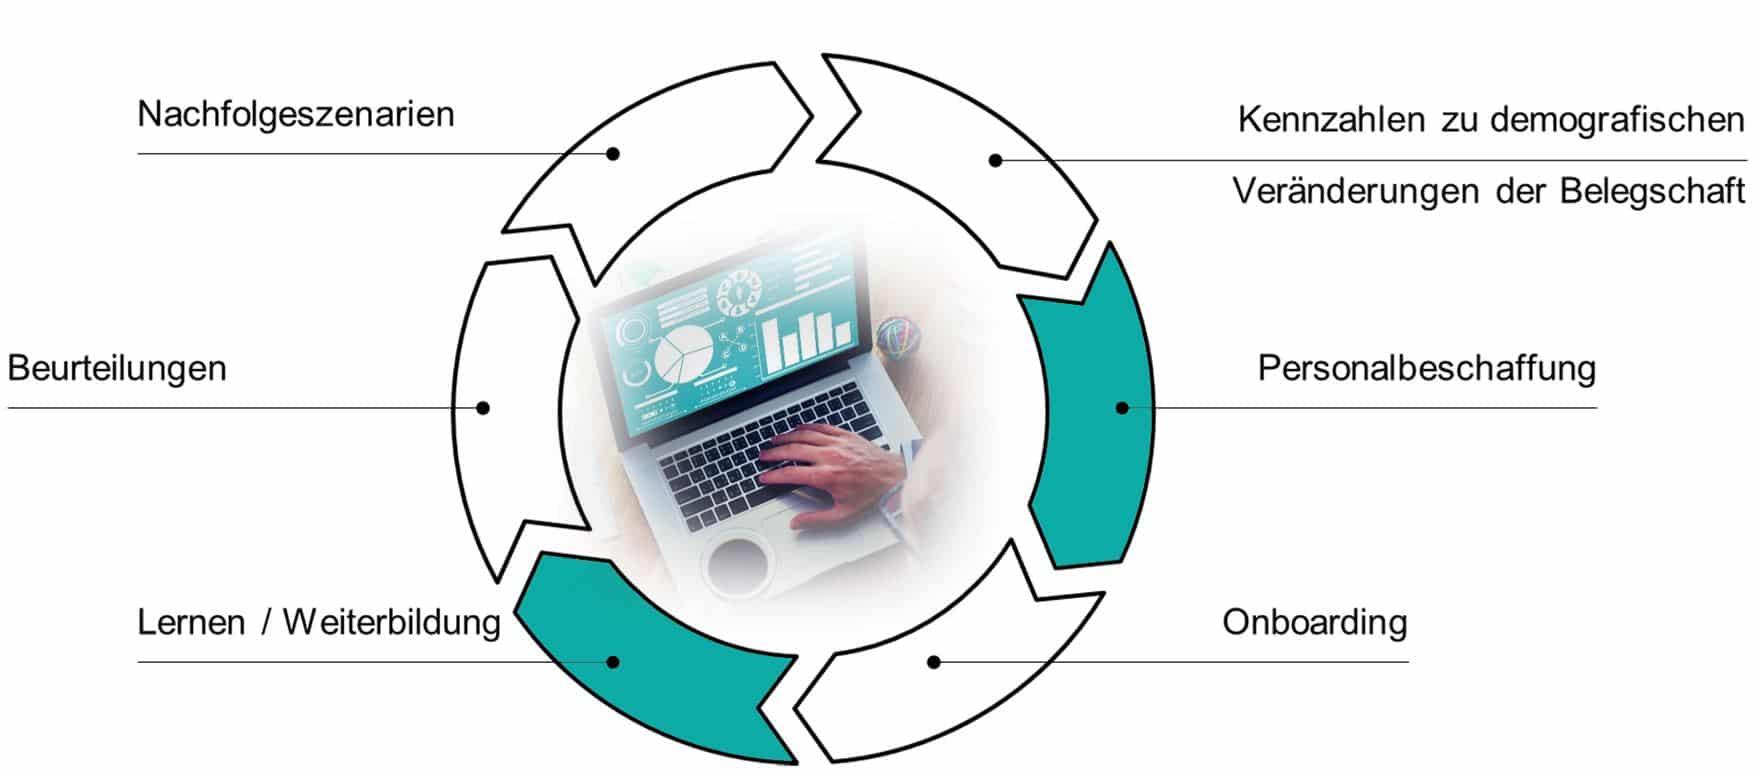 Zukunft des Personalmanagements mit CONET & SAP-SuccessFactors: HR Lifecycle und Portfolio